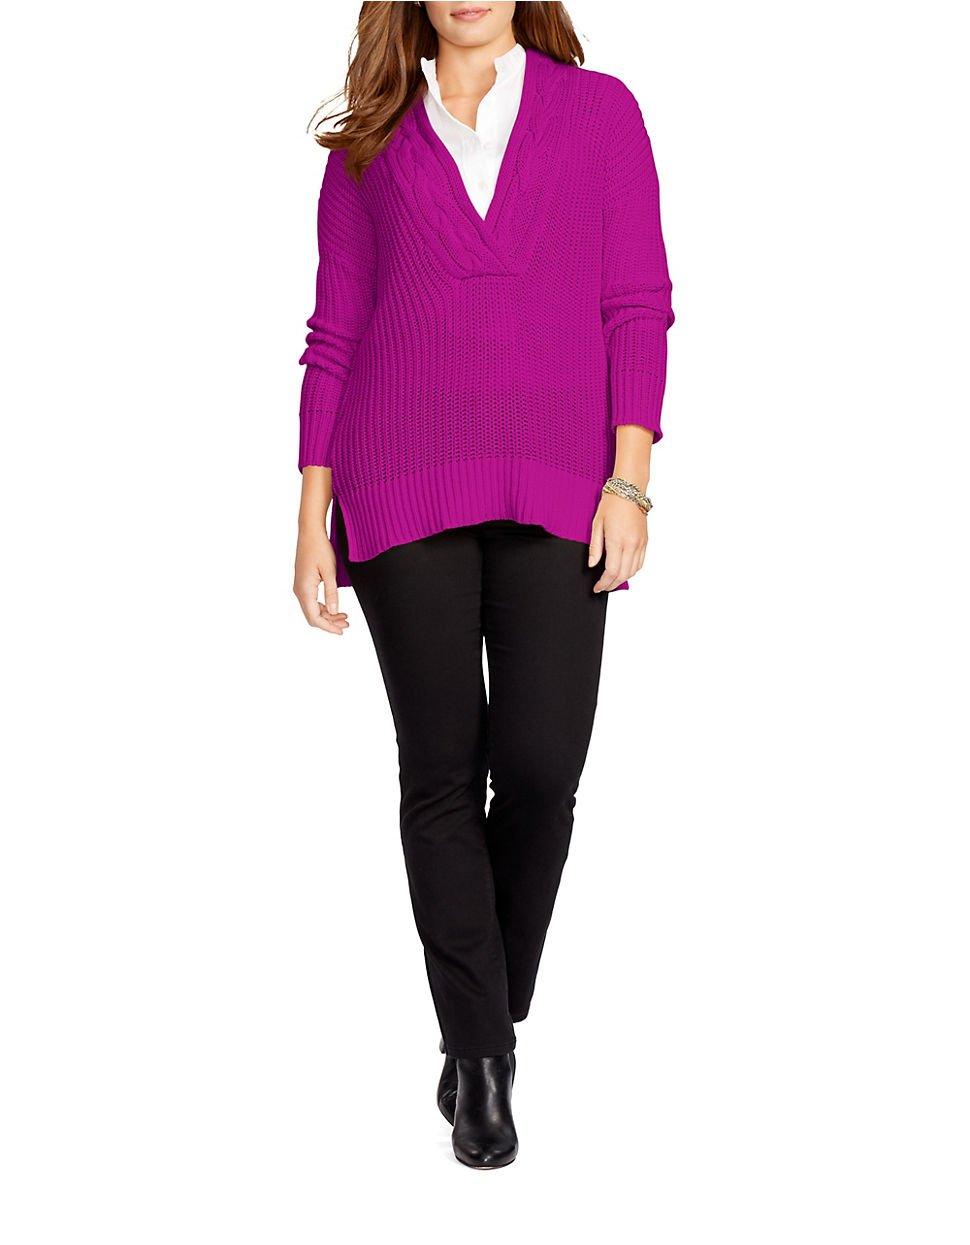 Lauren by ralph lauren Plus Ribbed Cotton Sweater in Purple | Lyst